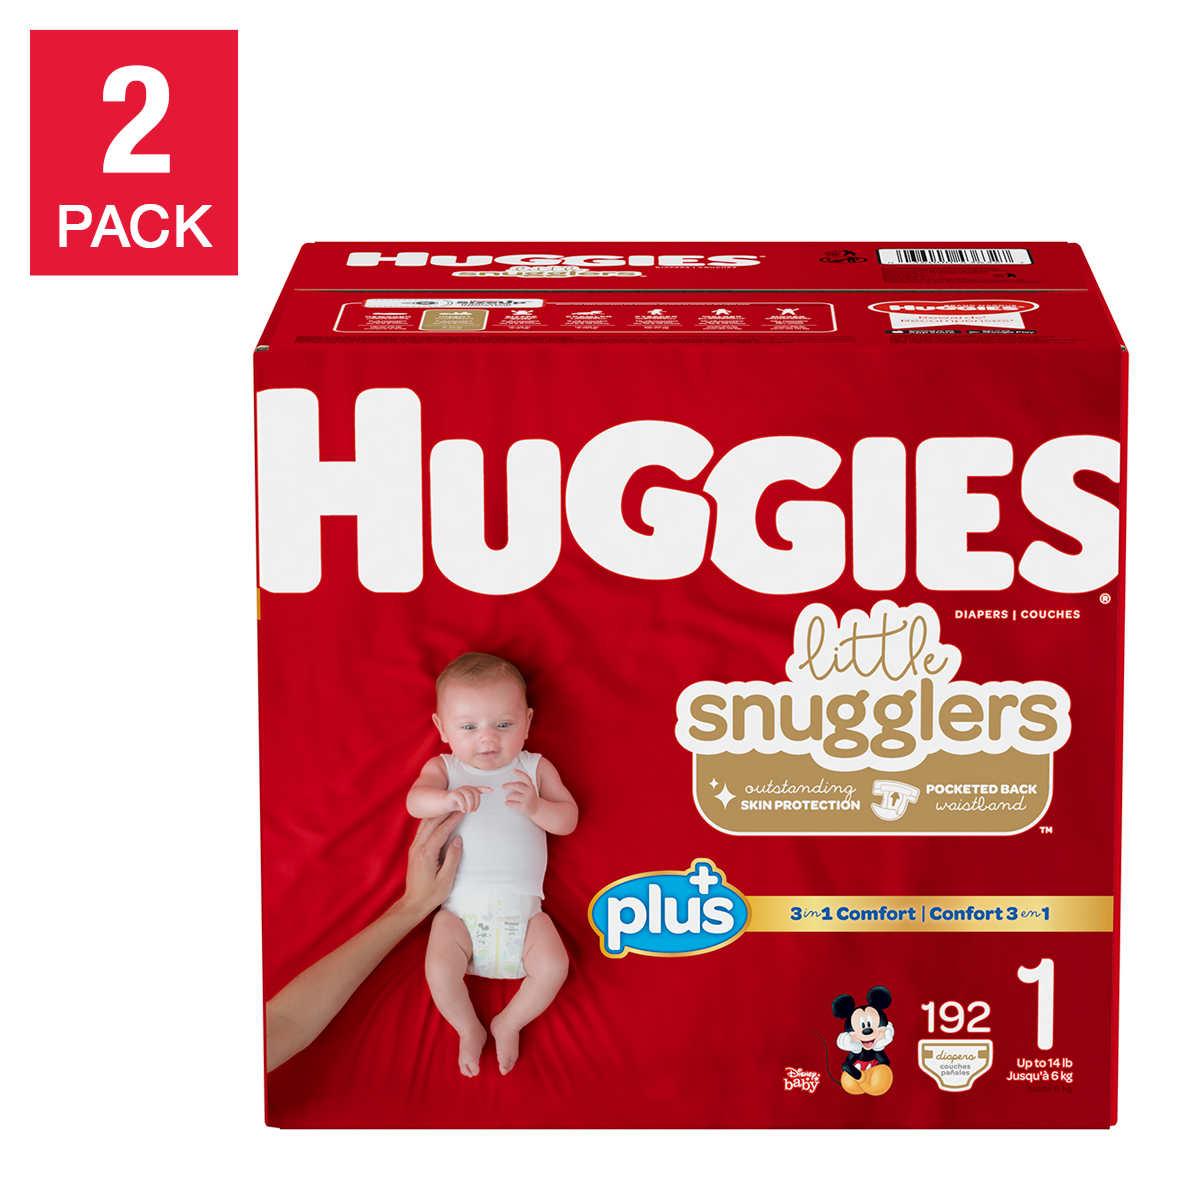 Huggies Plus Diapers Sizes 1 6 2 Pack